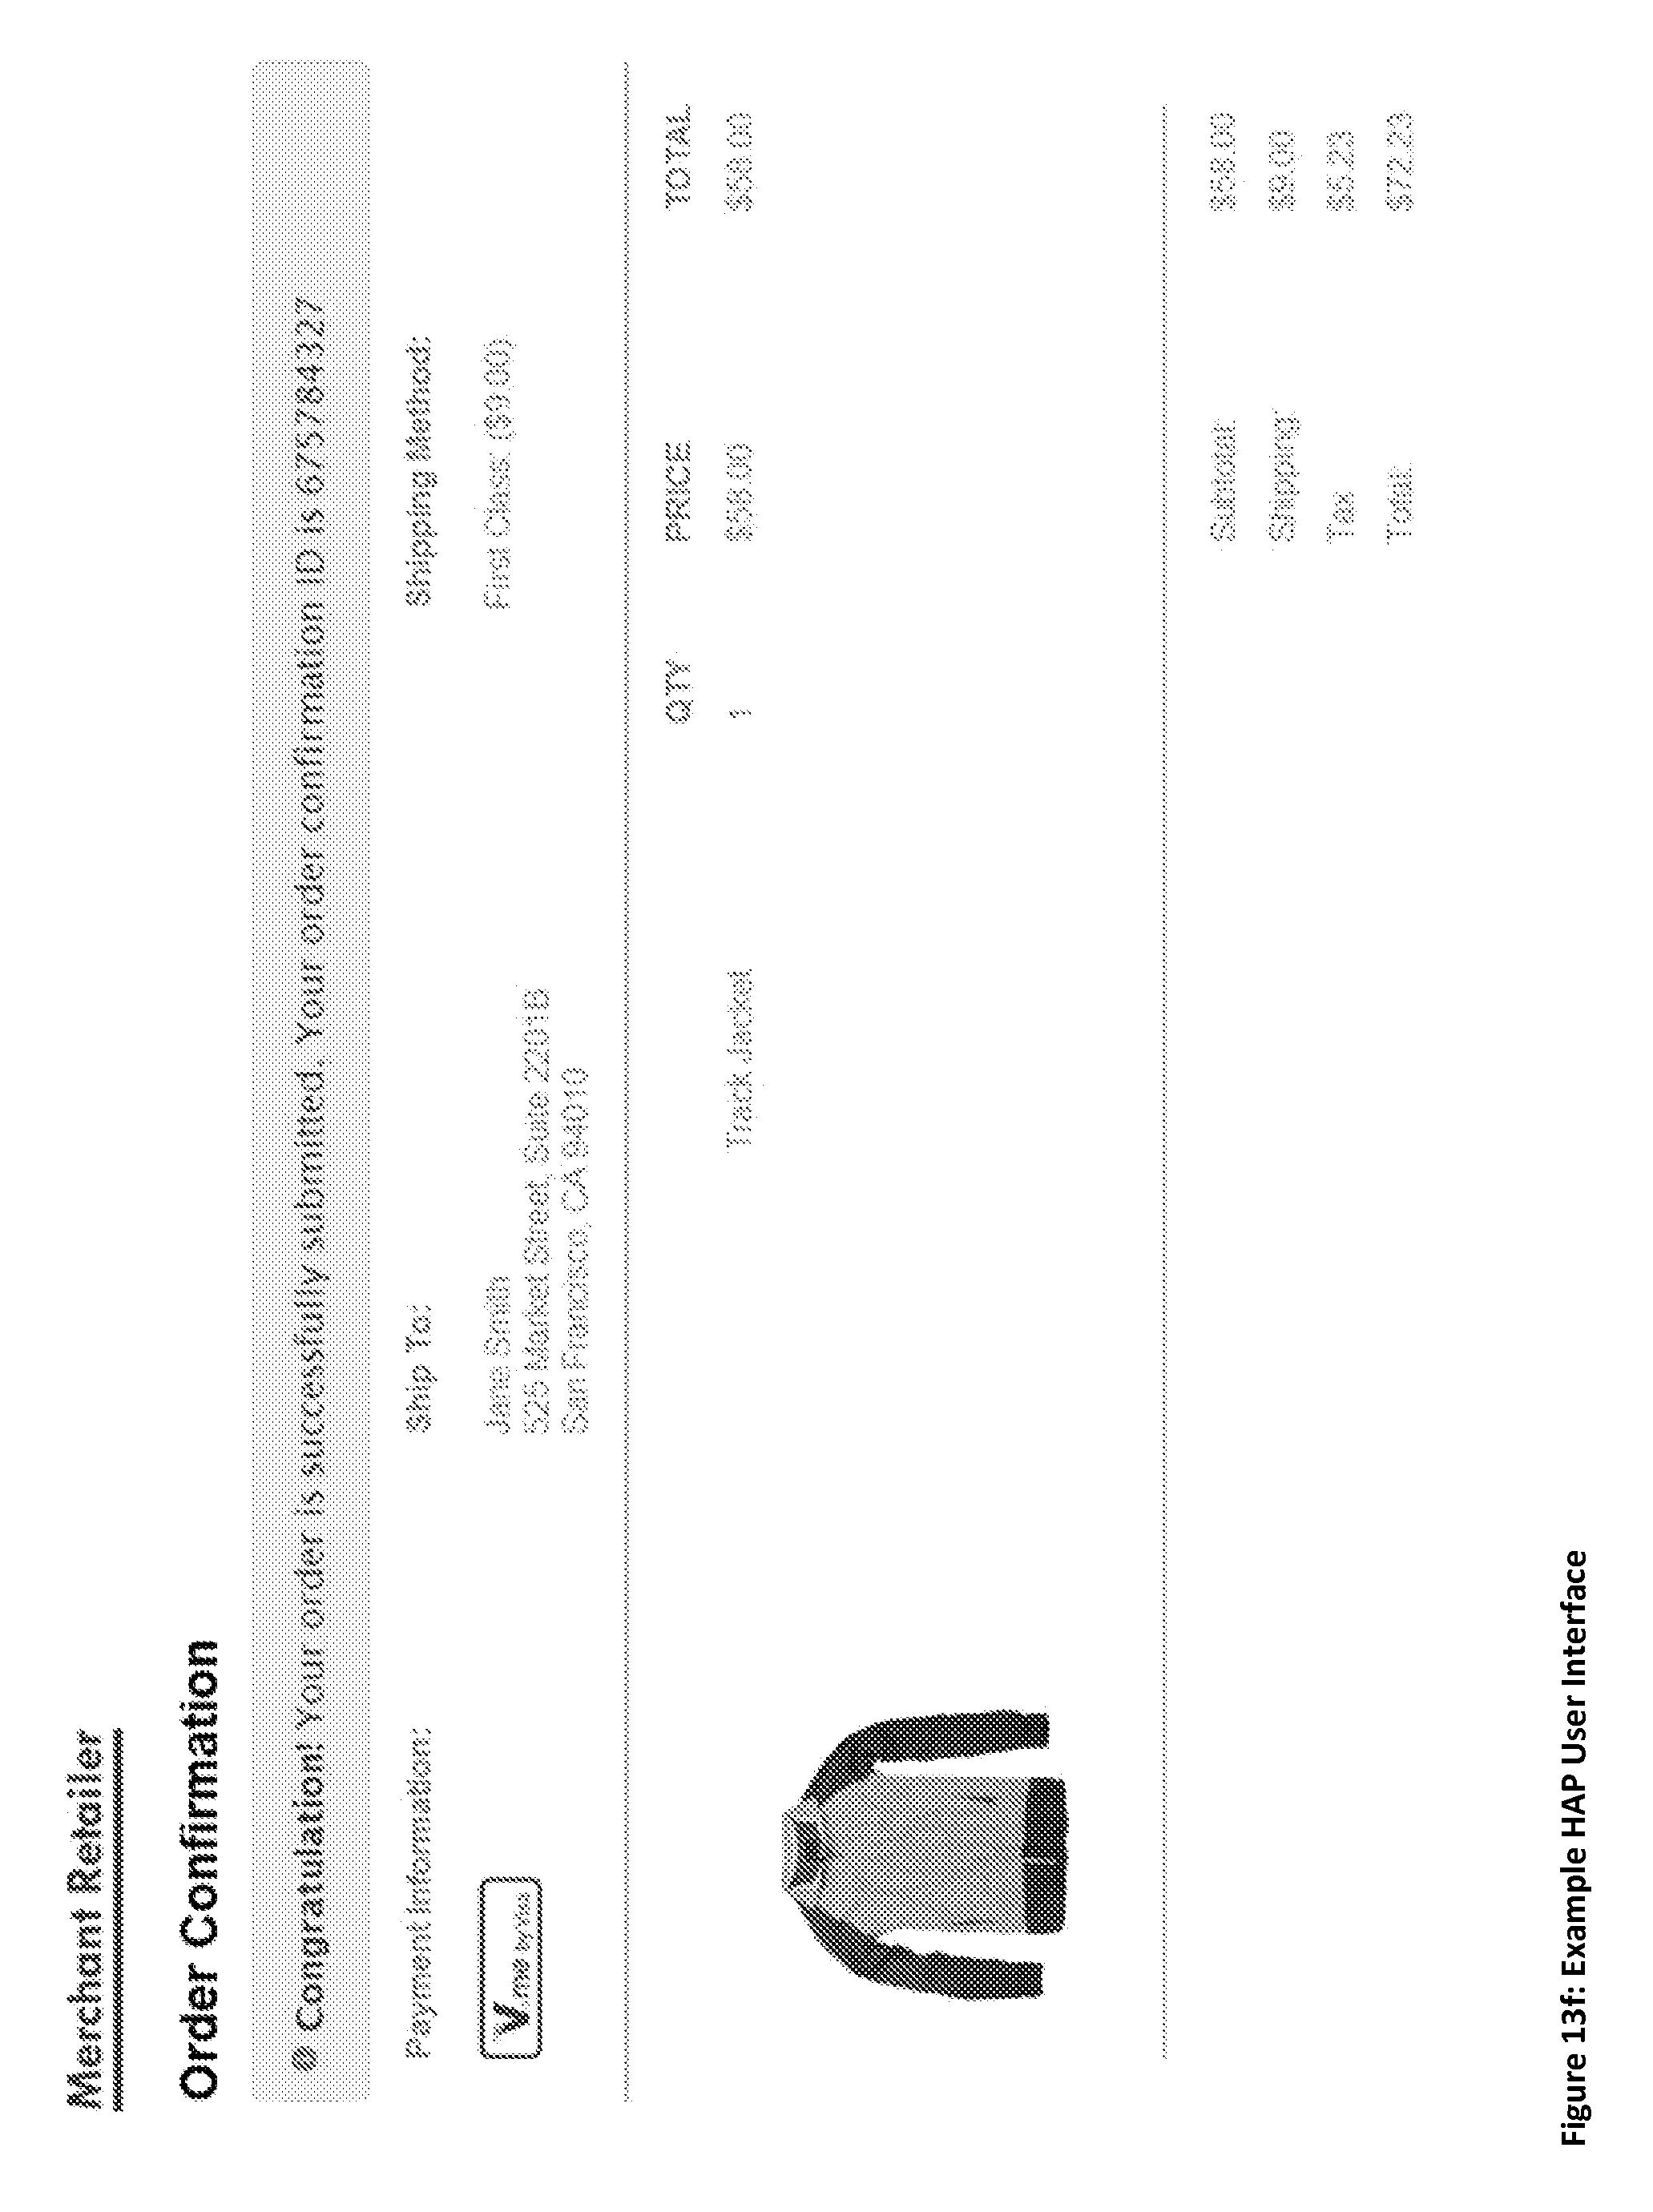 Patent US 10,154,084 B2